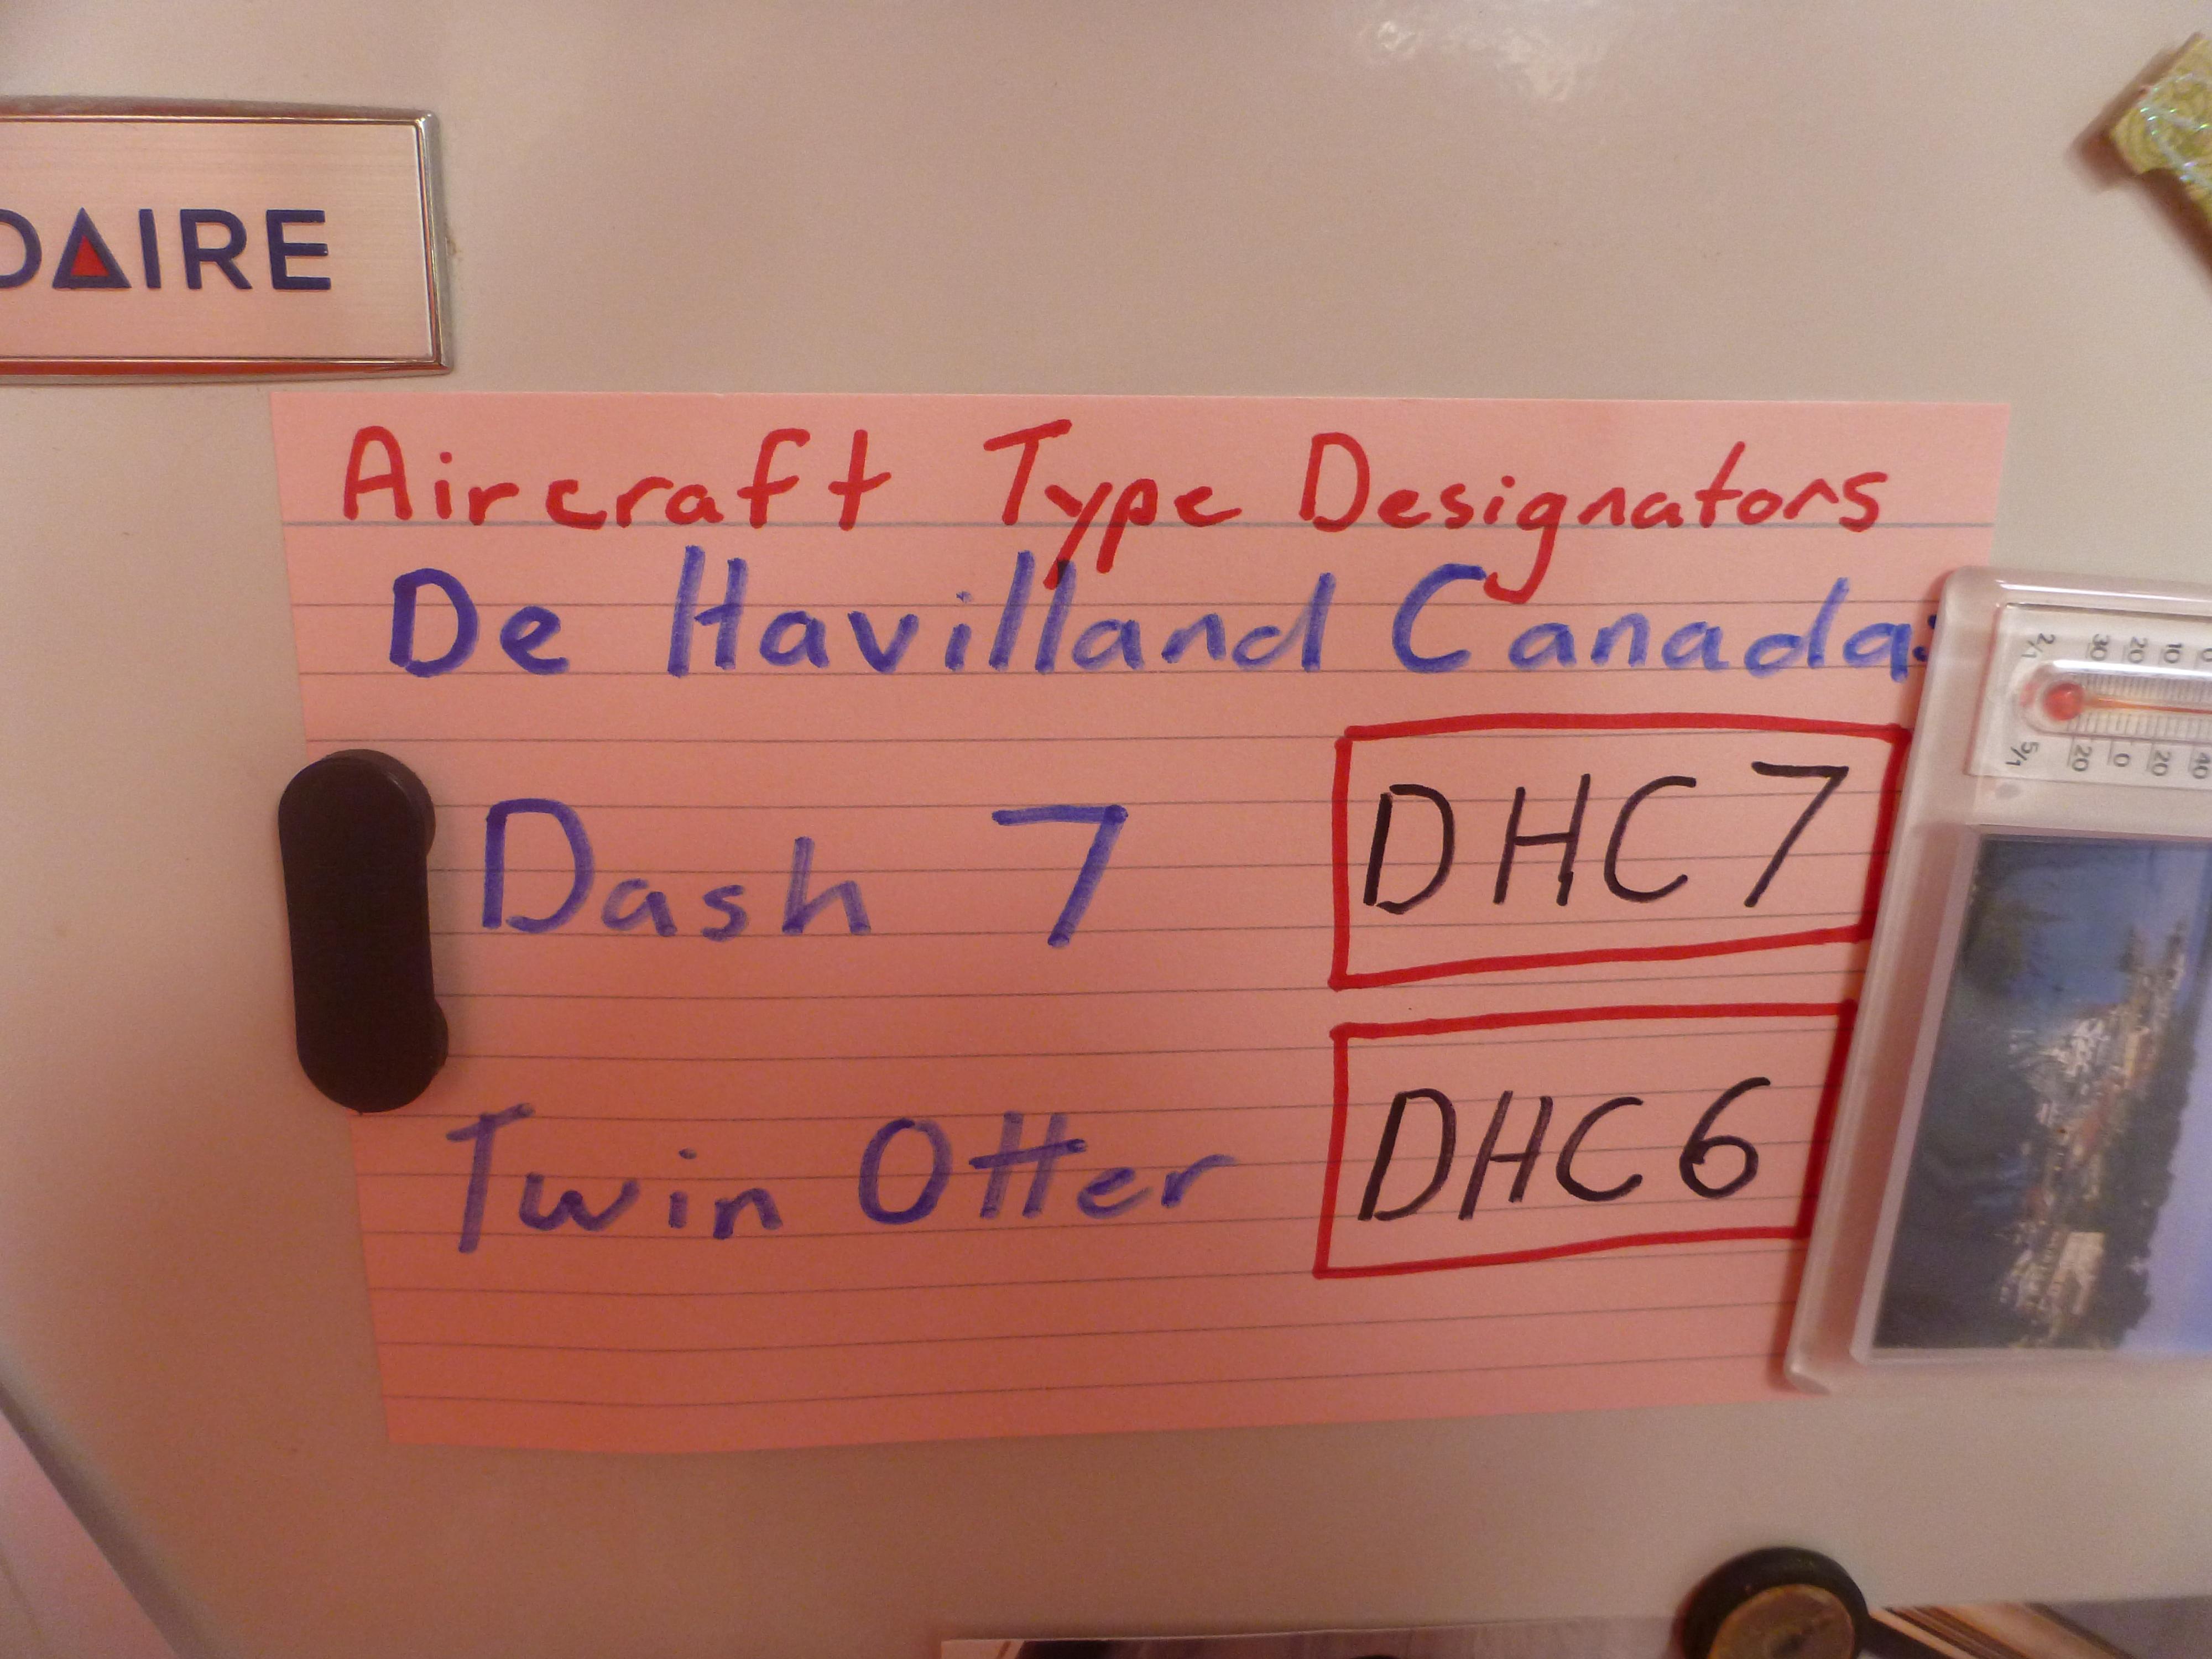 AFTN Flight Planning Pass Your Message